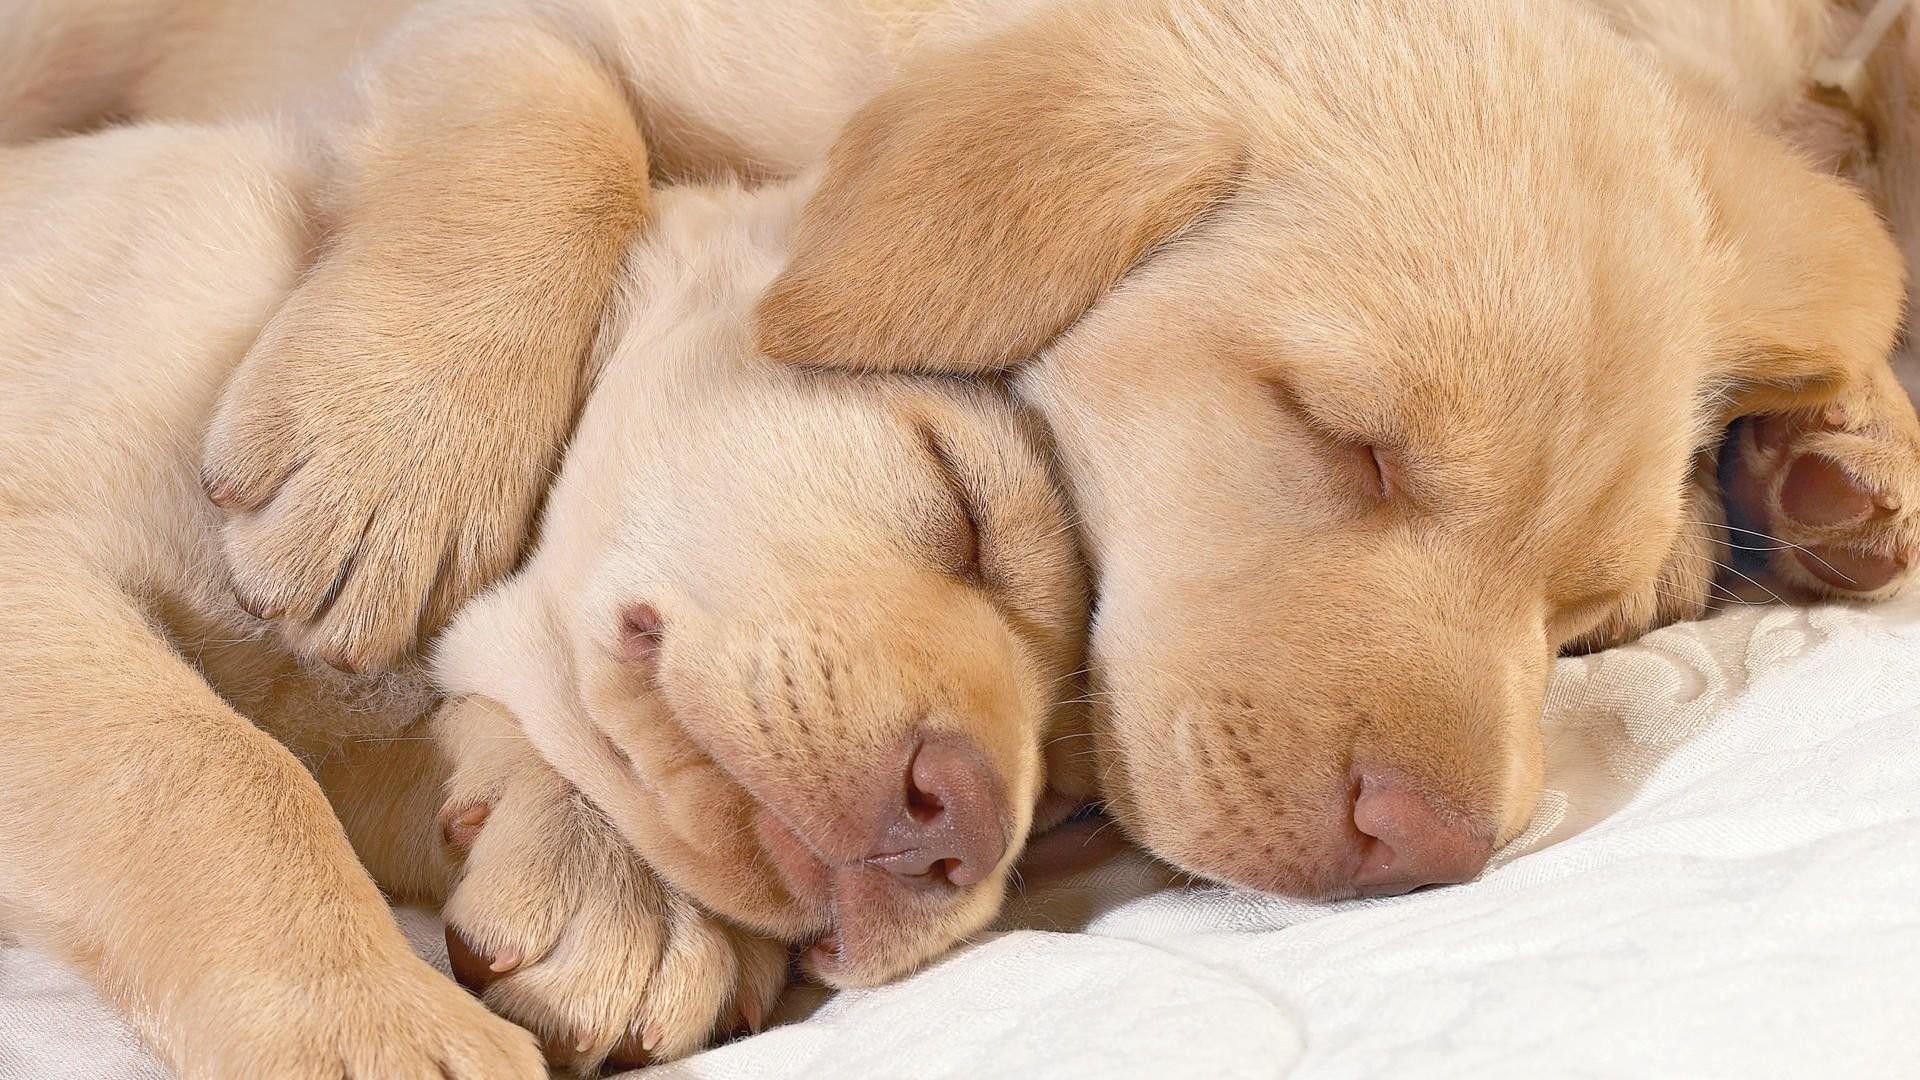 Sleeping Labrador Puppies 842105